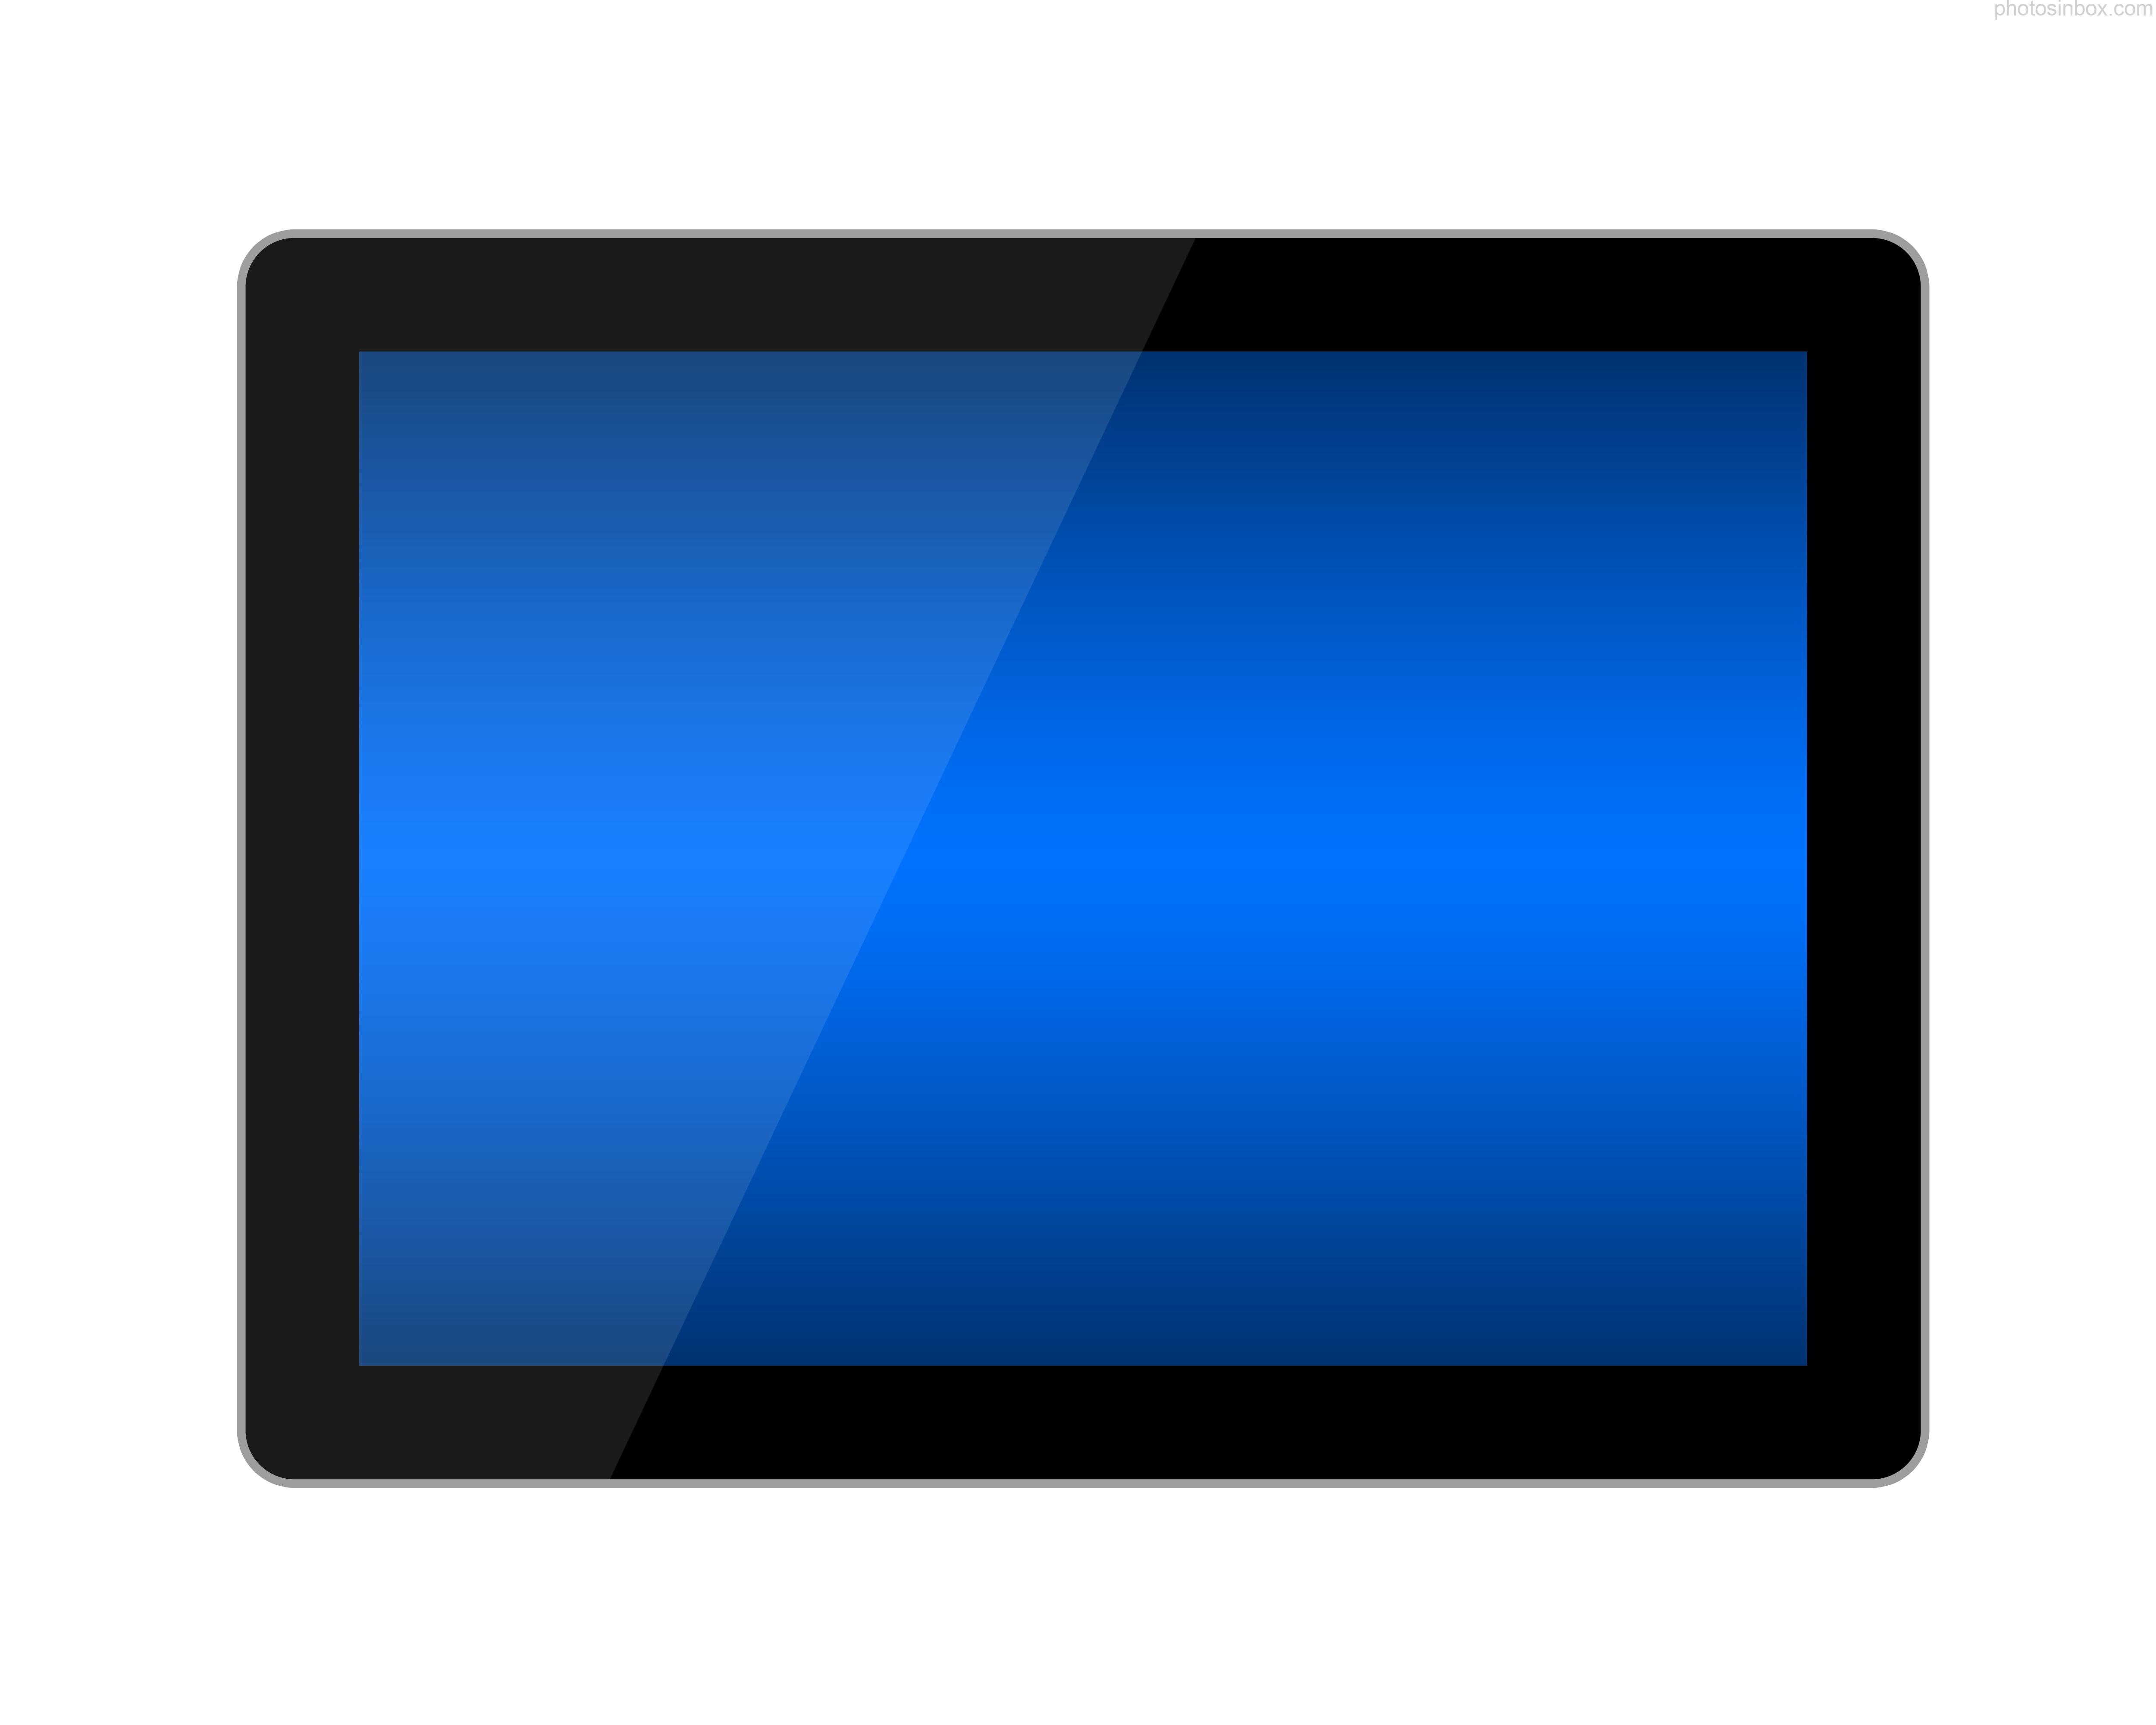 Tablet Computer Screen